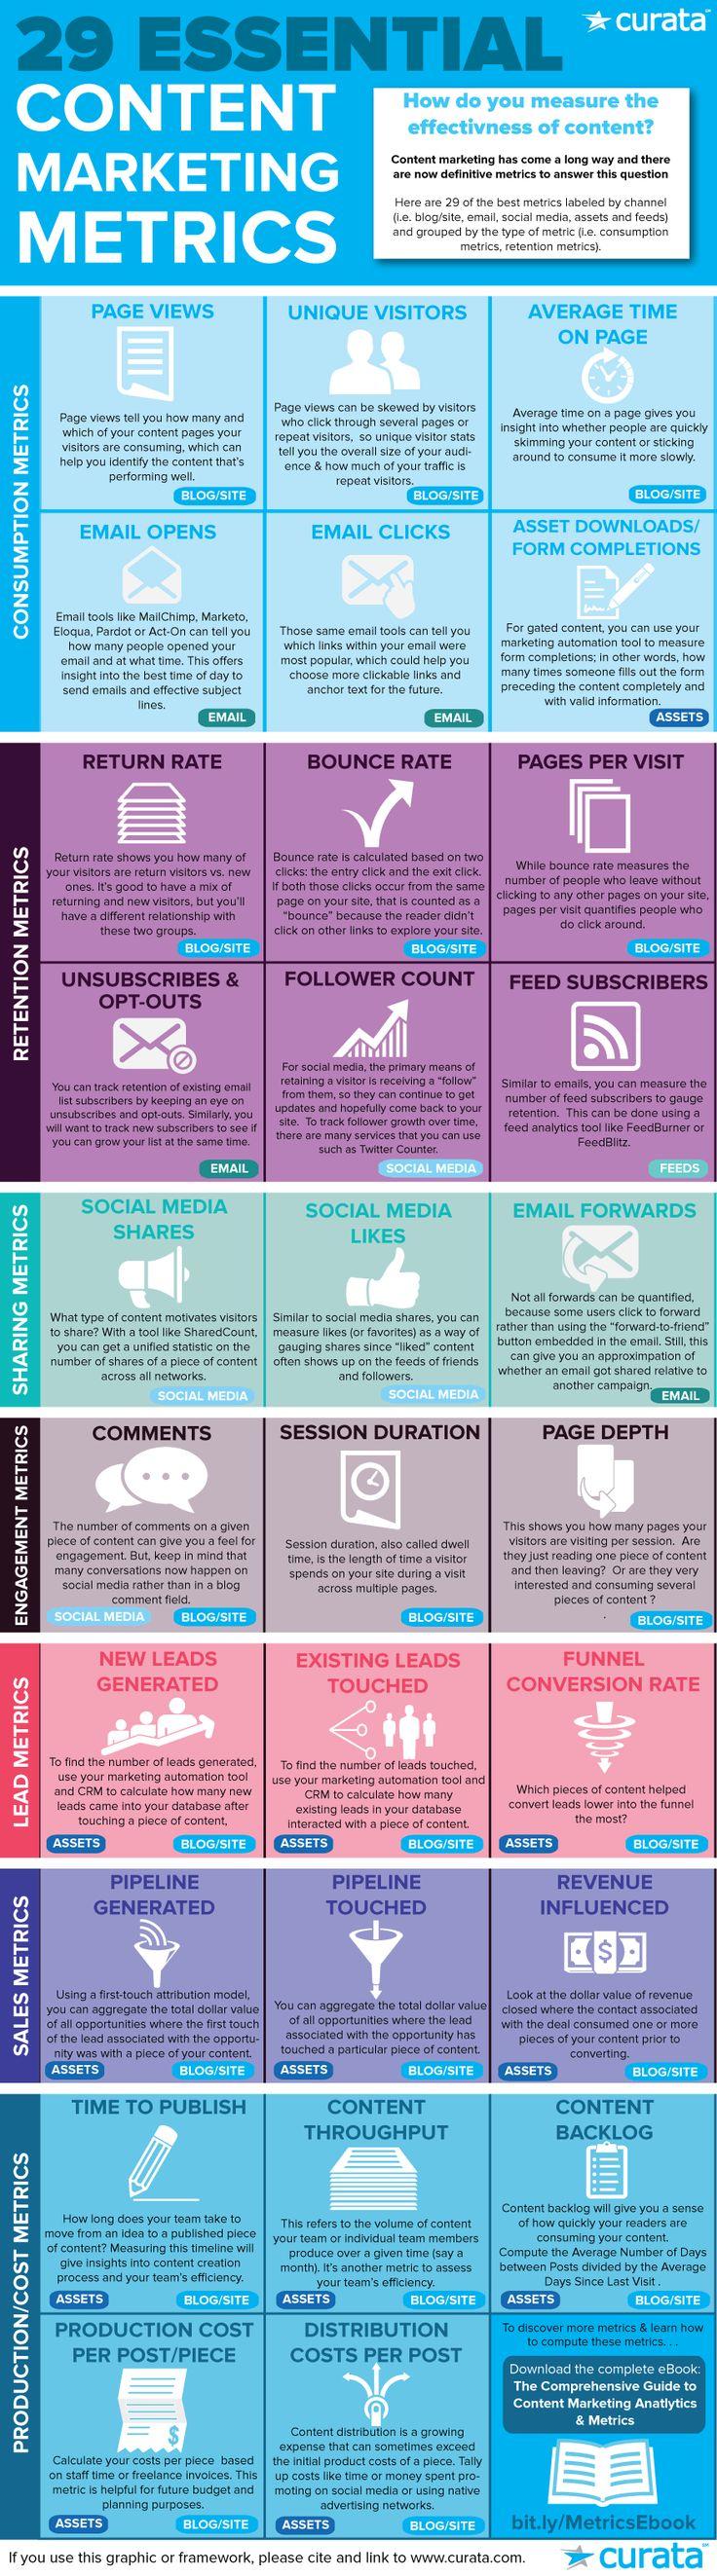 29 Essential Content Marketing Metrics [Infographic] #KPI